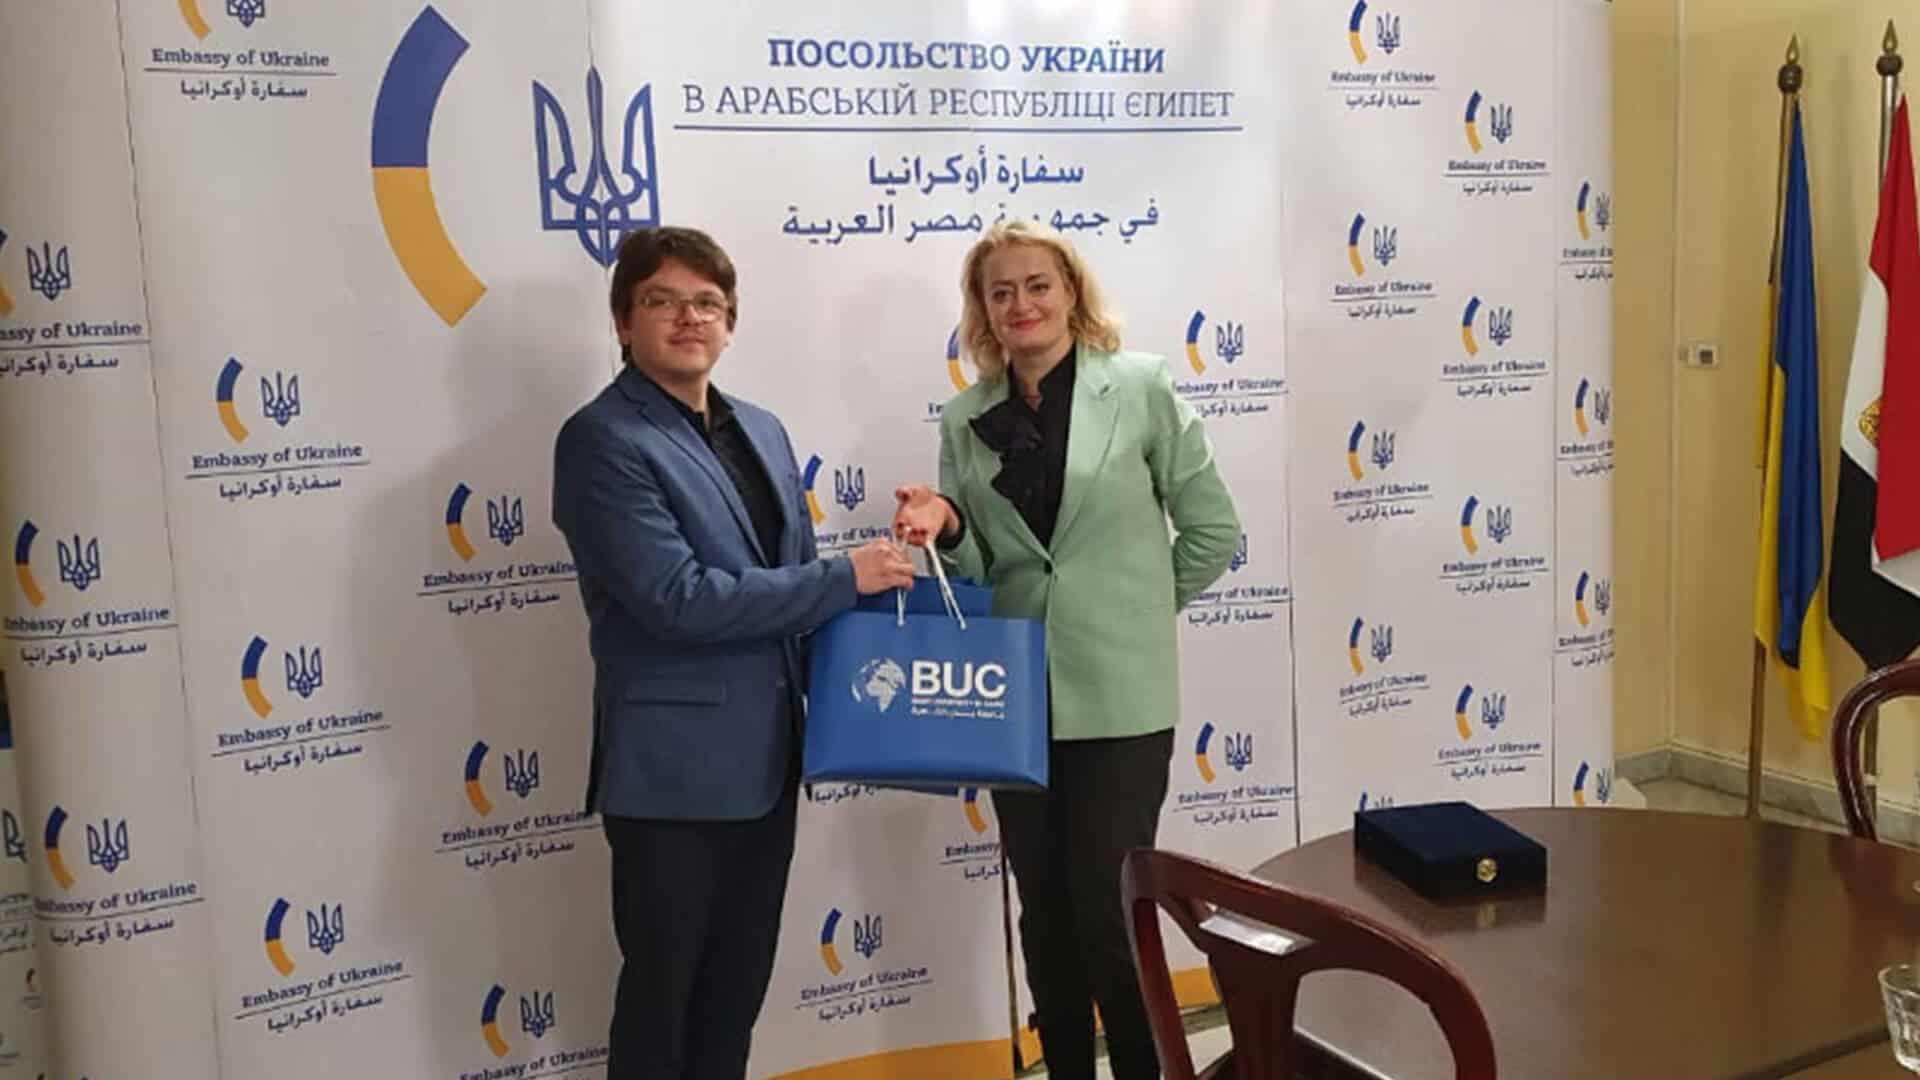 BUC - News - Cooperation Protocol Between the Ukrainian Embassy and BUC - 1